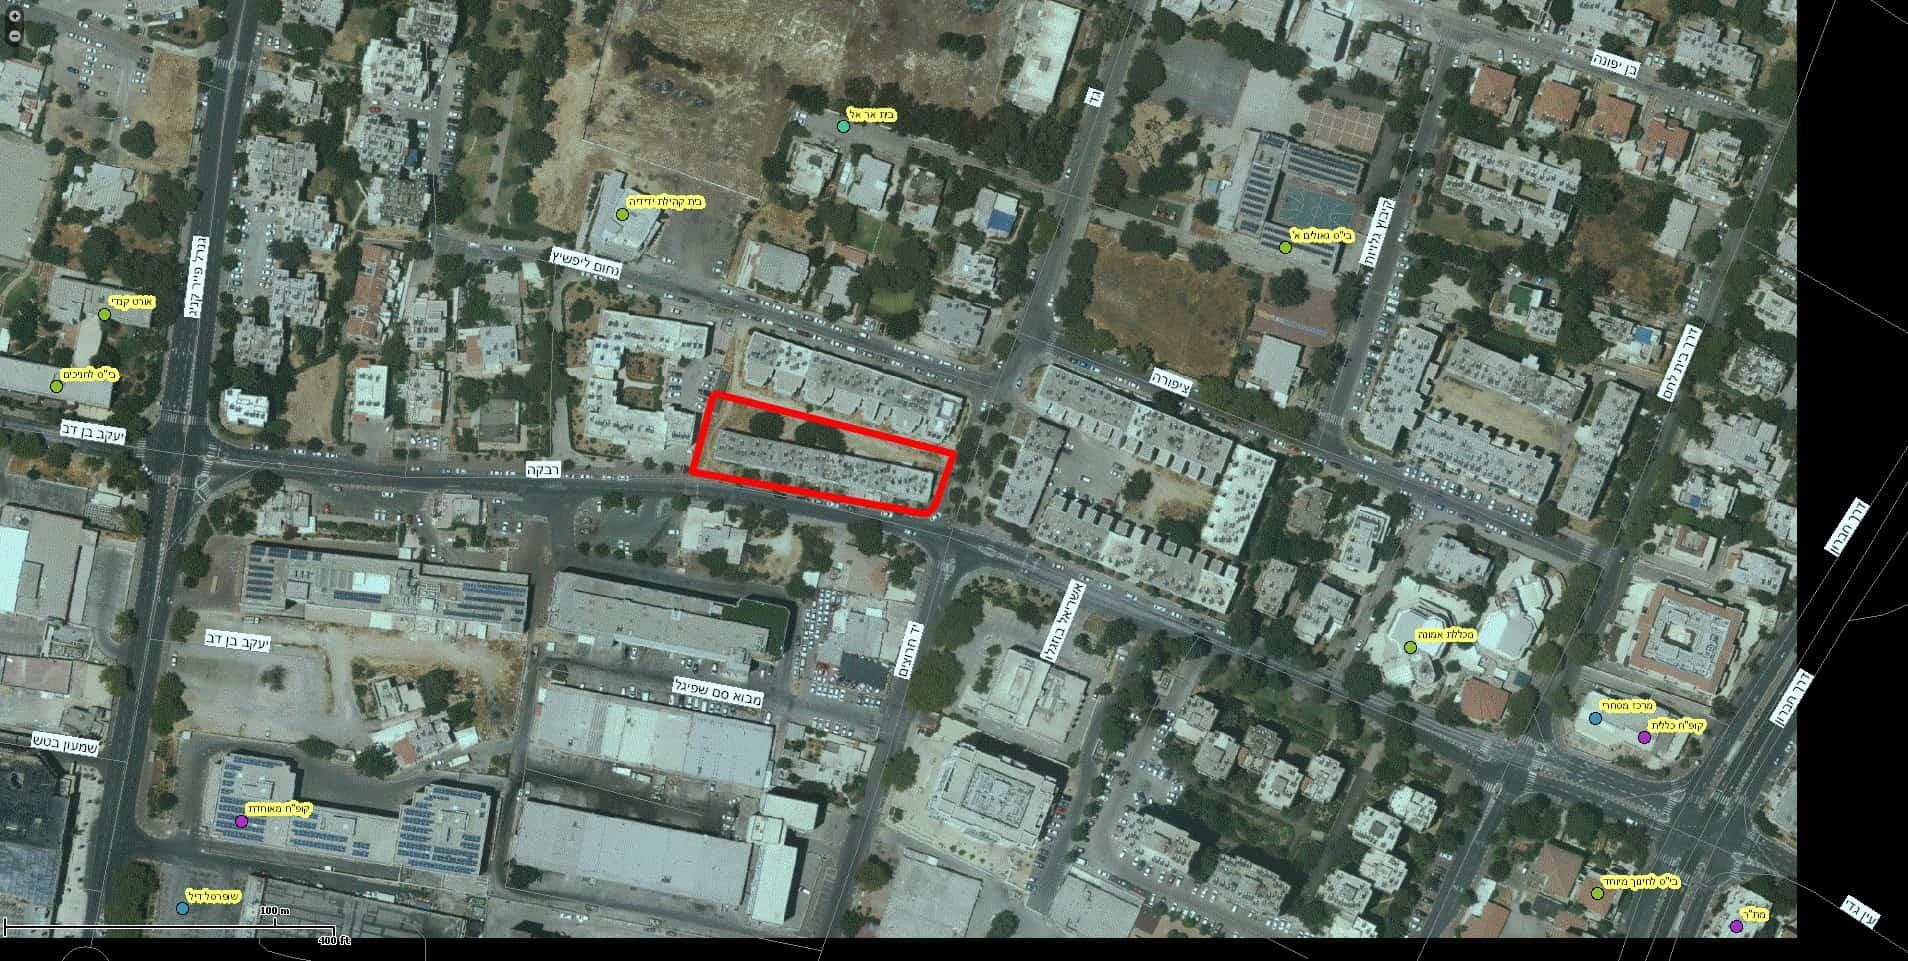 Rivka 22, Jérusalem – SIG